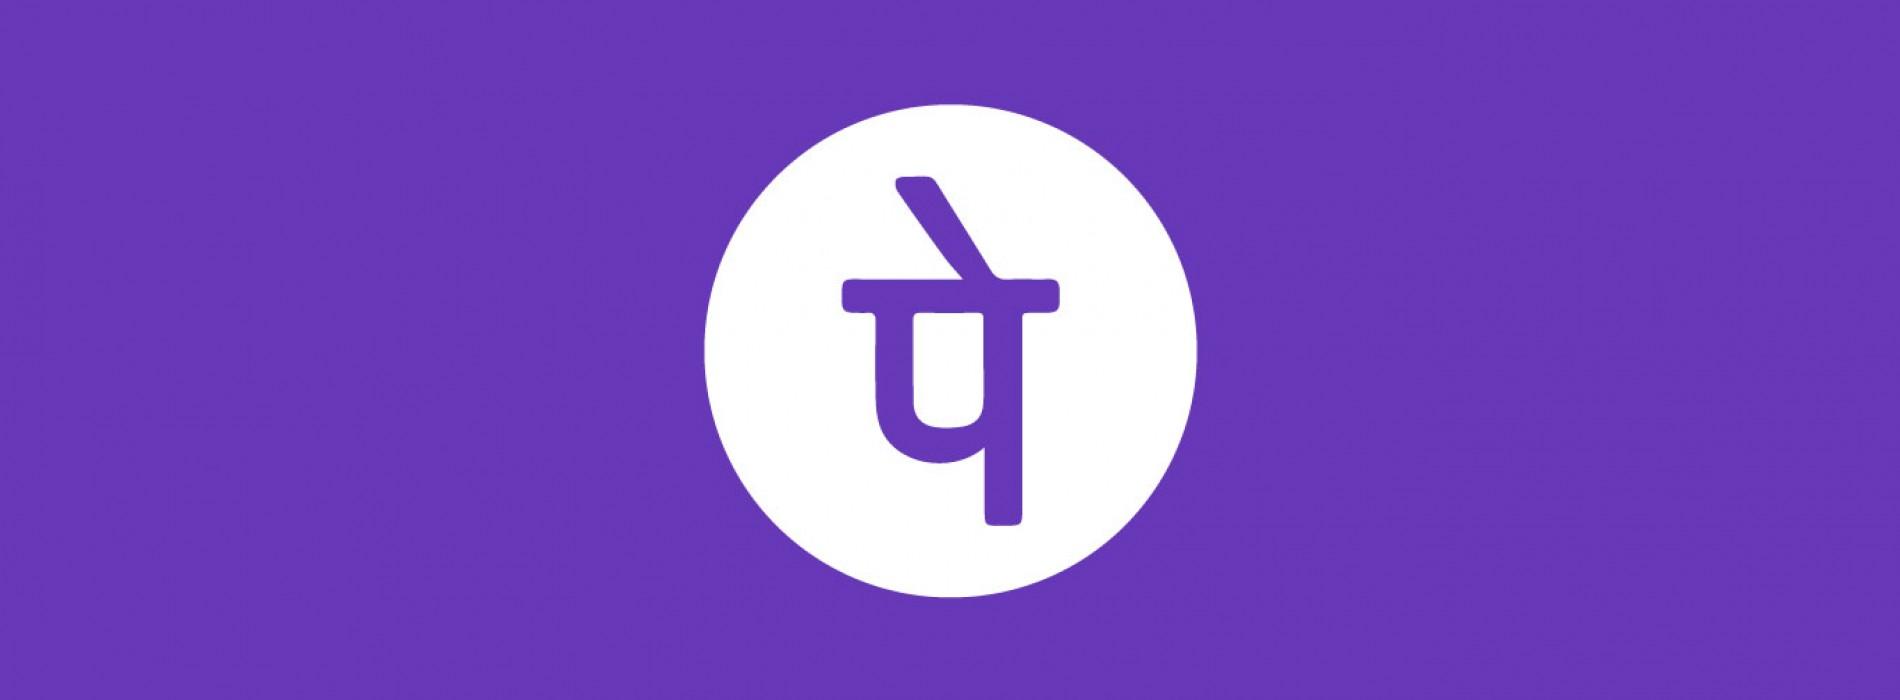 Goibibo announces partnership with PhonePe